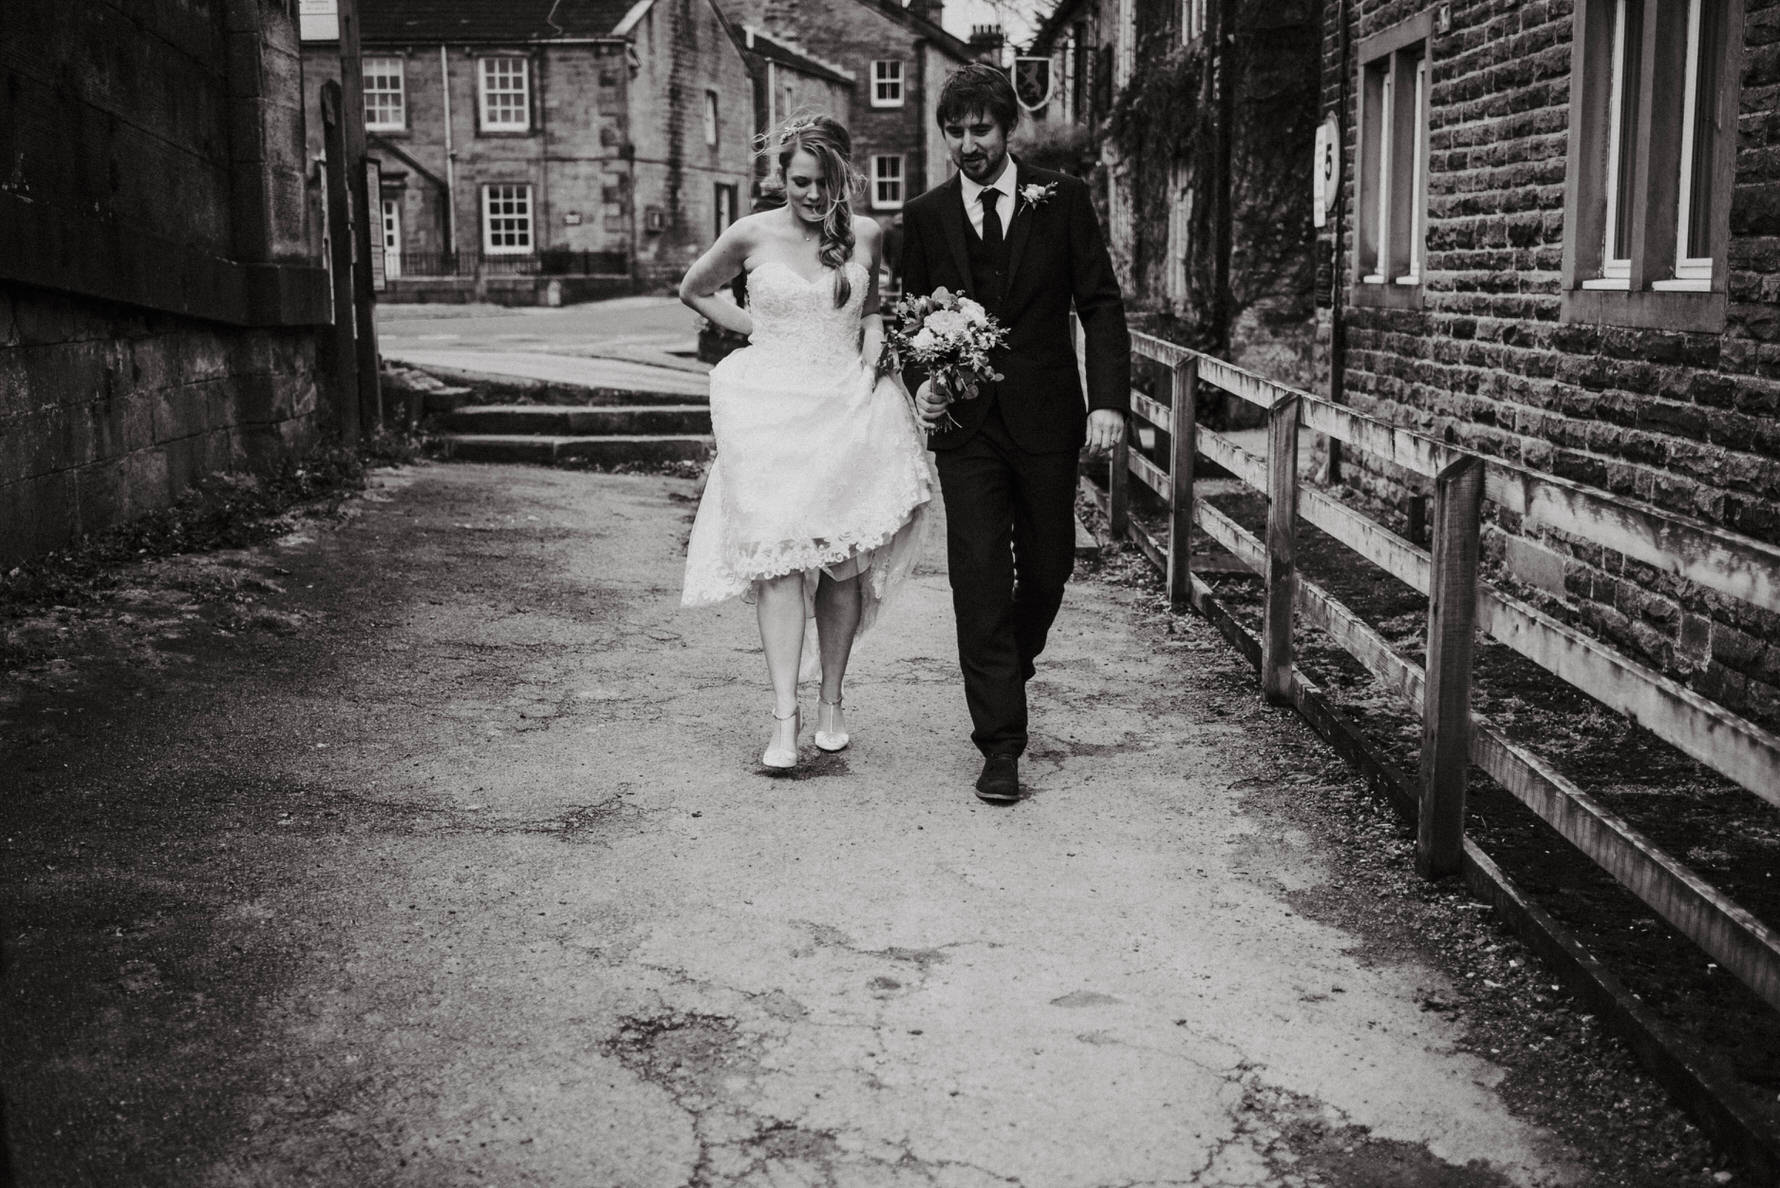 Cheshire unposed documentary wedding photographer Louise Jacob in Burnsall, Yorkshire Dales